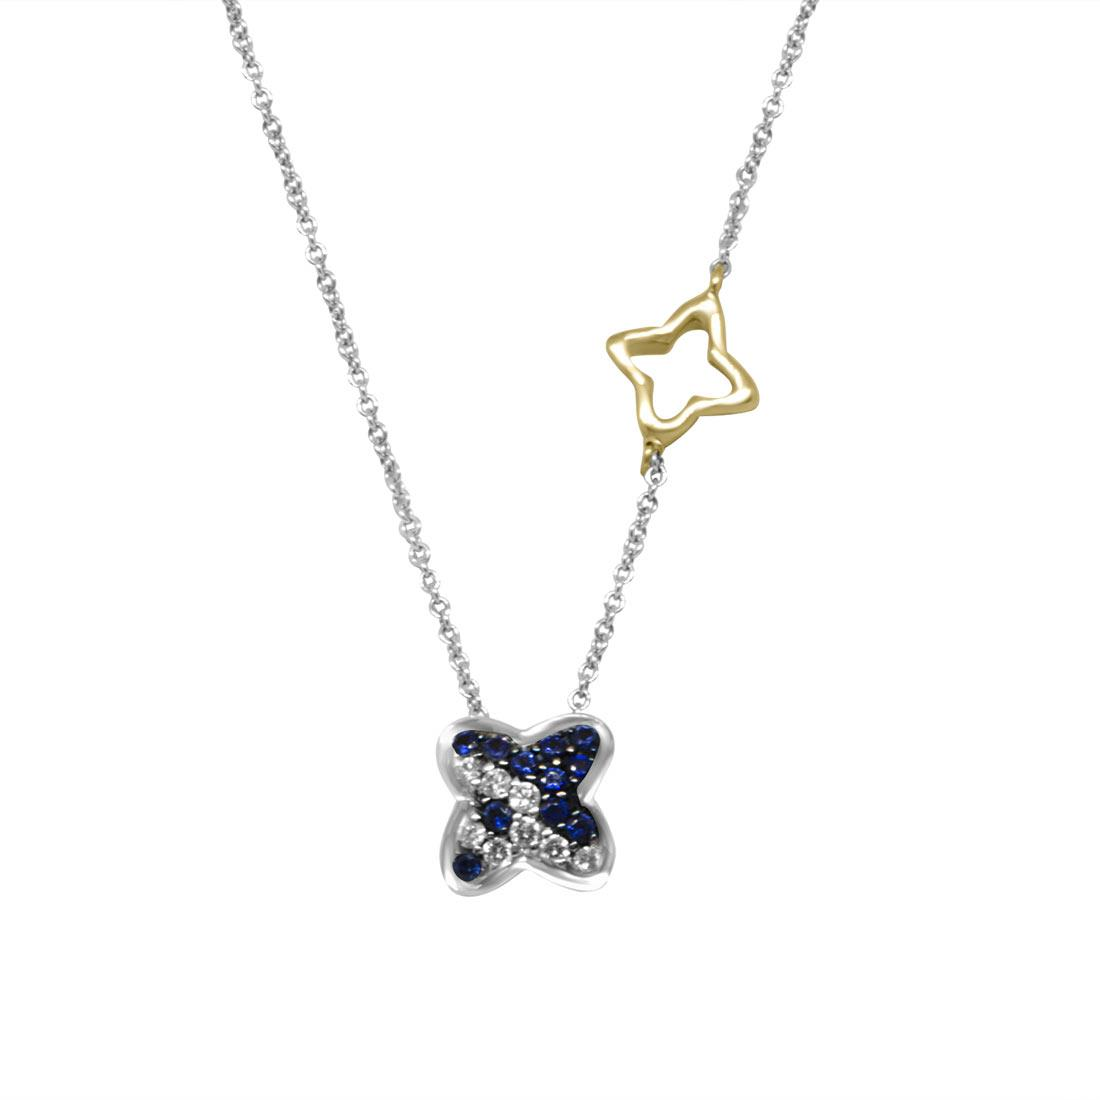 Collana  girogola in oro bianco con diamanti ct 0.09 e zaffiri ct 0.15 - RECARLO